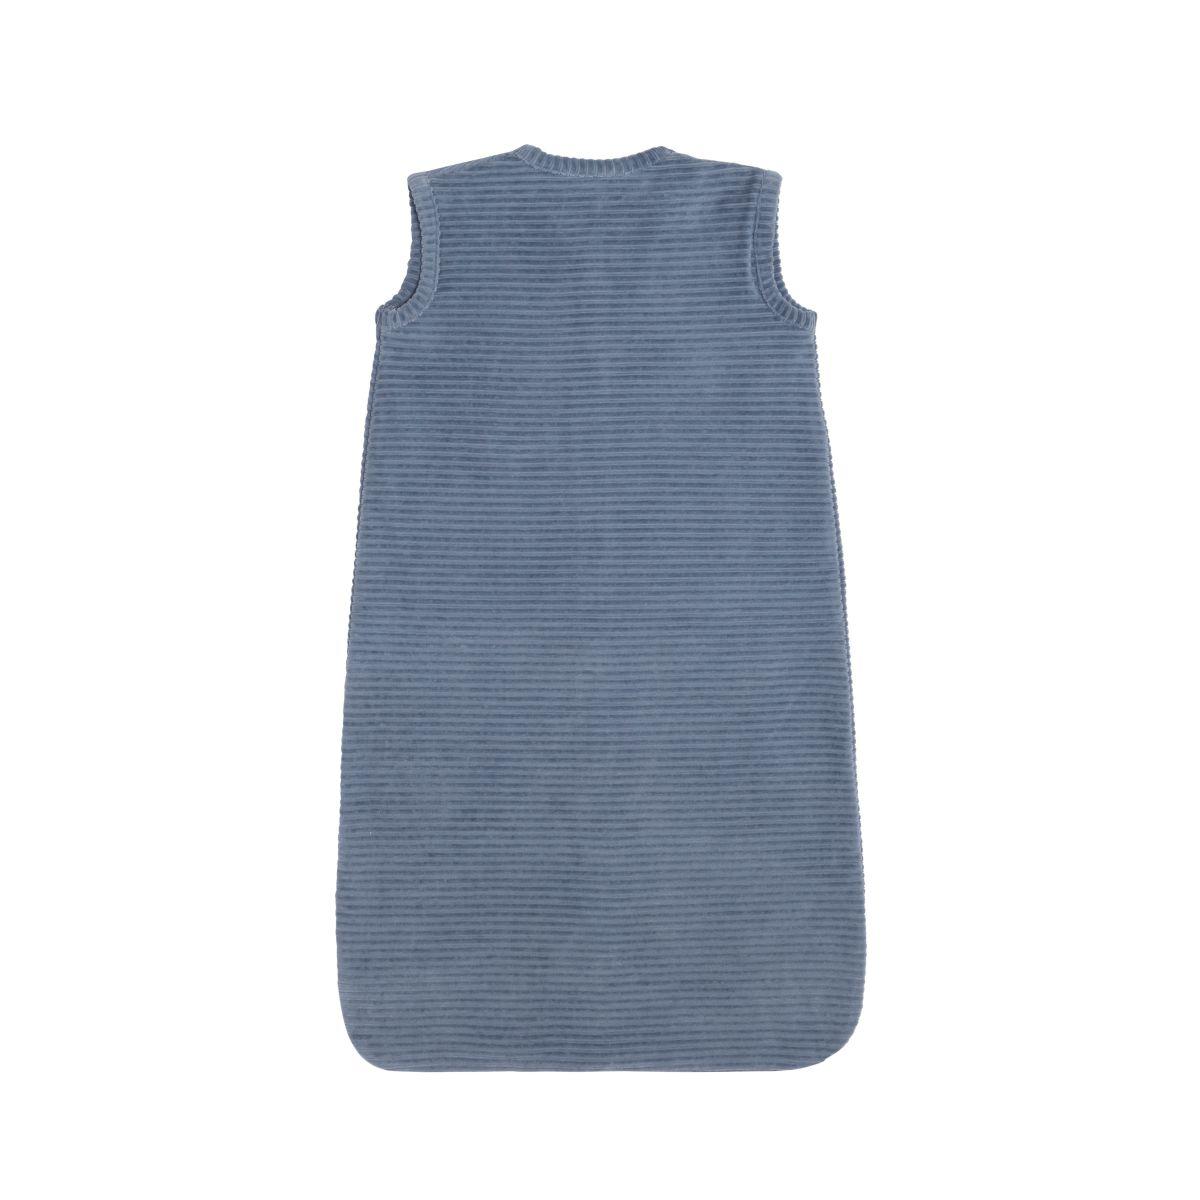 babys only bo02407303851 sense slaapzak vintage blue 90 cm 2